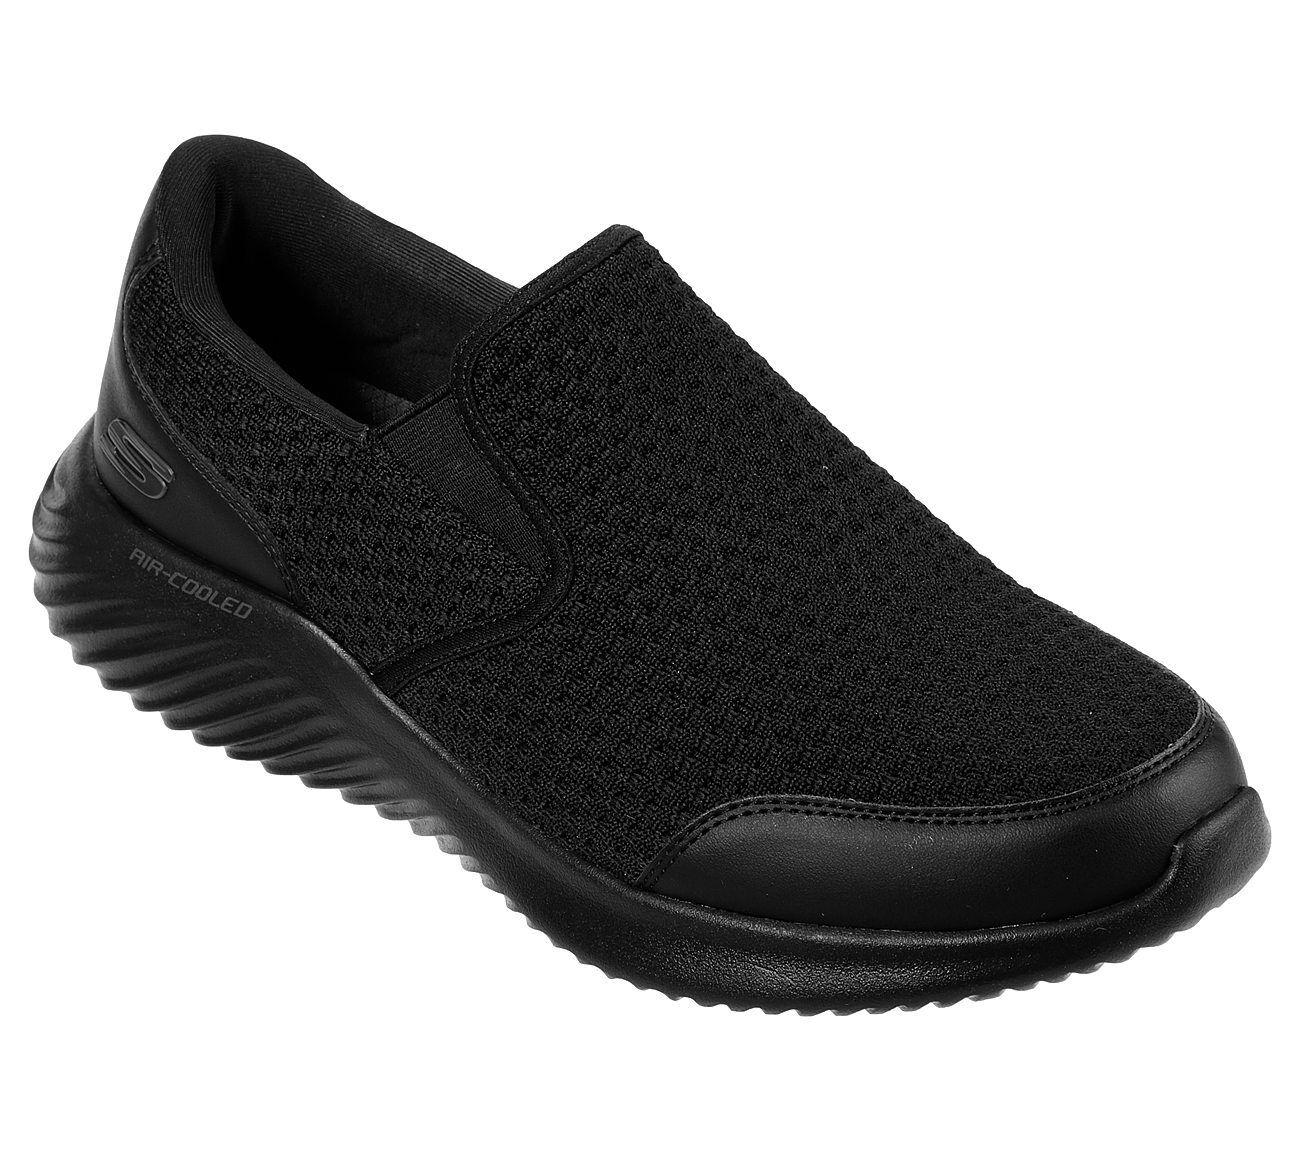 Skechers Wide Fit Black shoes Men Memory Foam Comfort Slip On Casual Mesh 52507